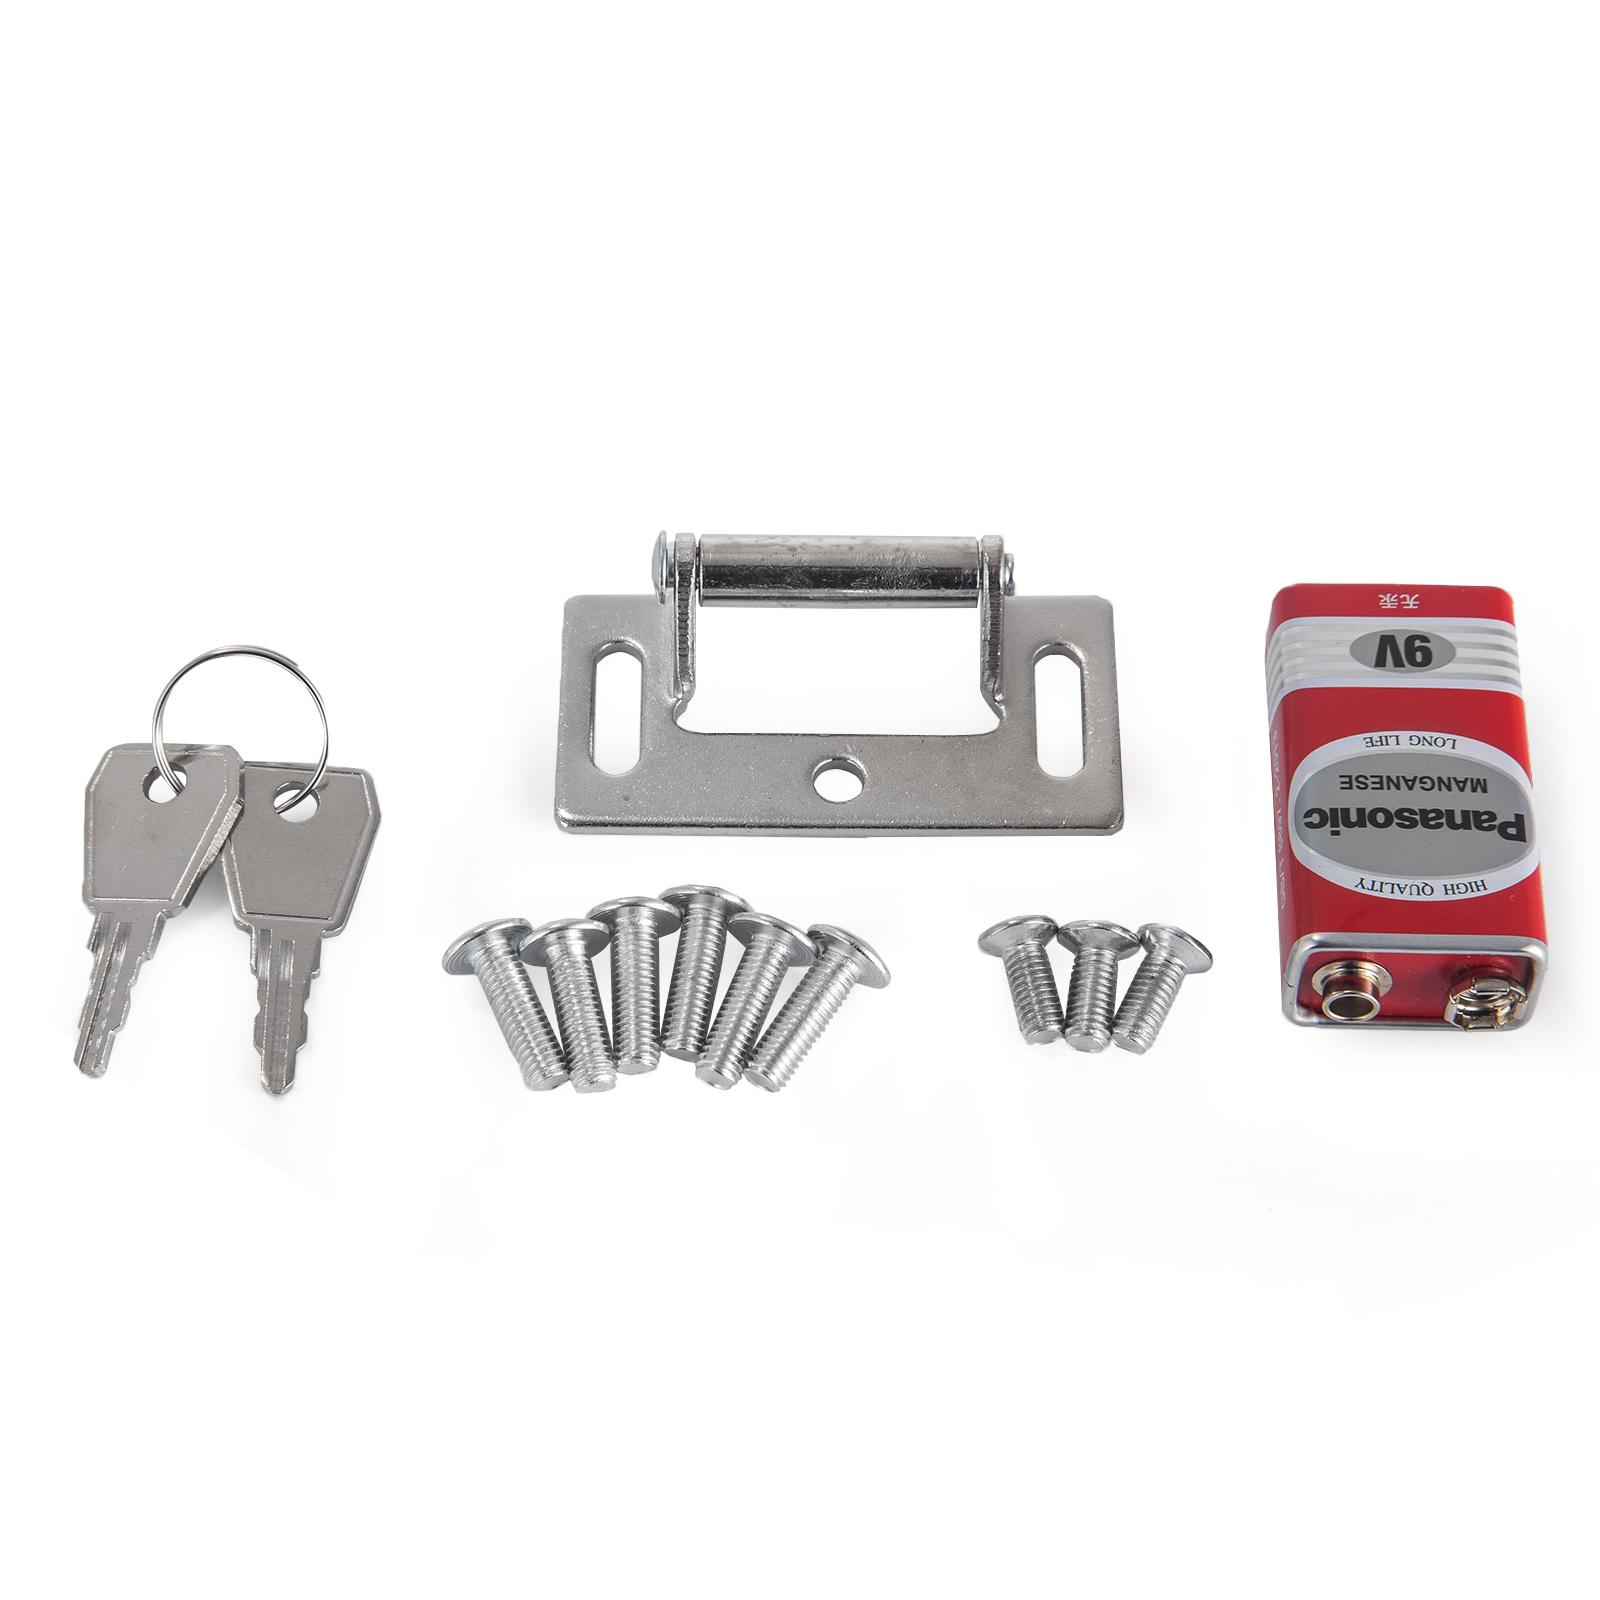 Panic Bar Door Locks: Door Push Bar Panic Bar Exit Device Lock Handle/Alarm